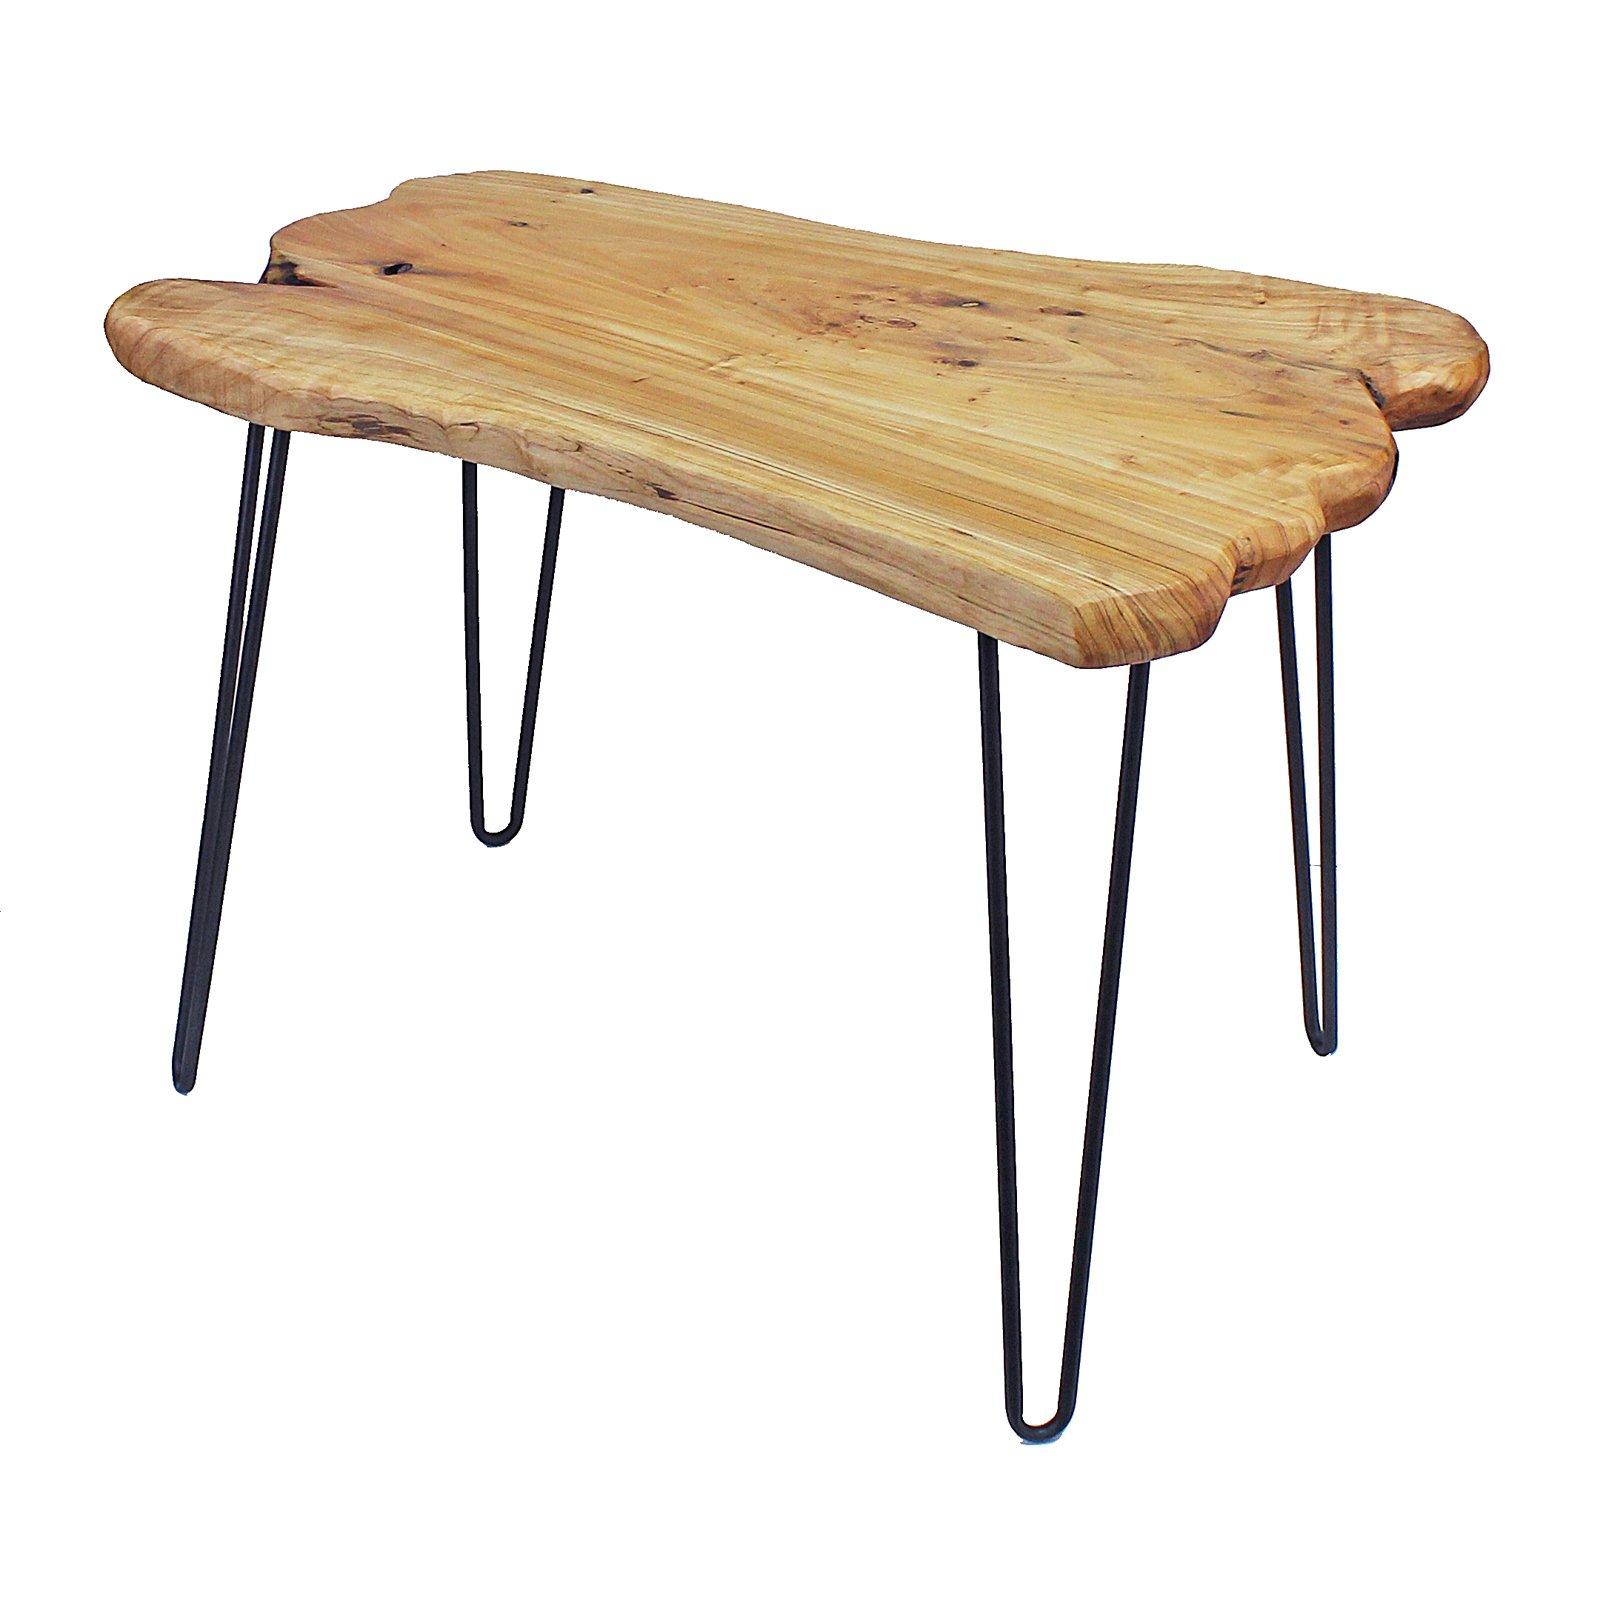 WELLAND Cedar Live Edge Hairpin Coffee Table 28'' L x 20'' W x 20.5'' T by WELLAND (Image #2)